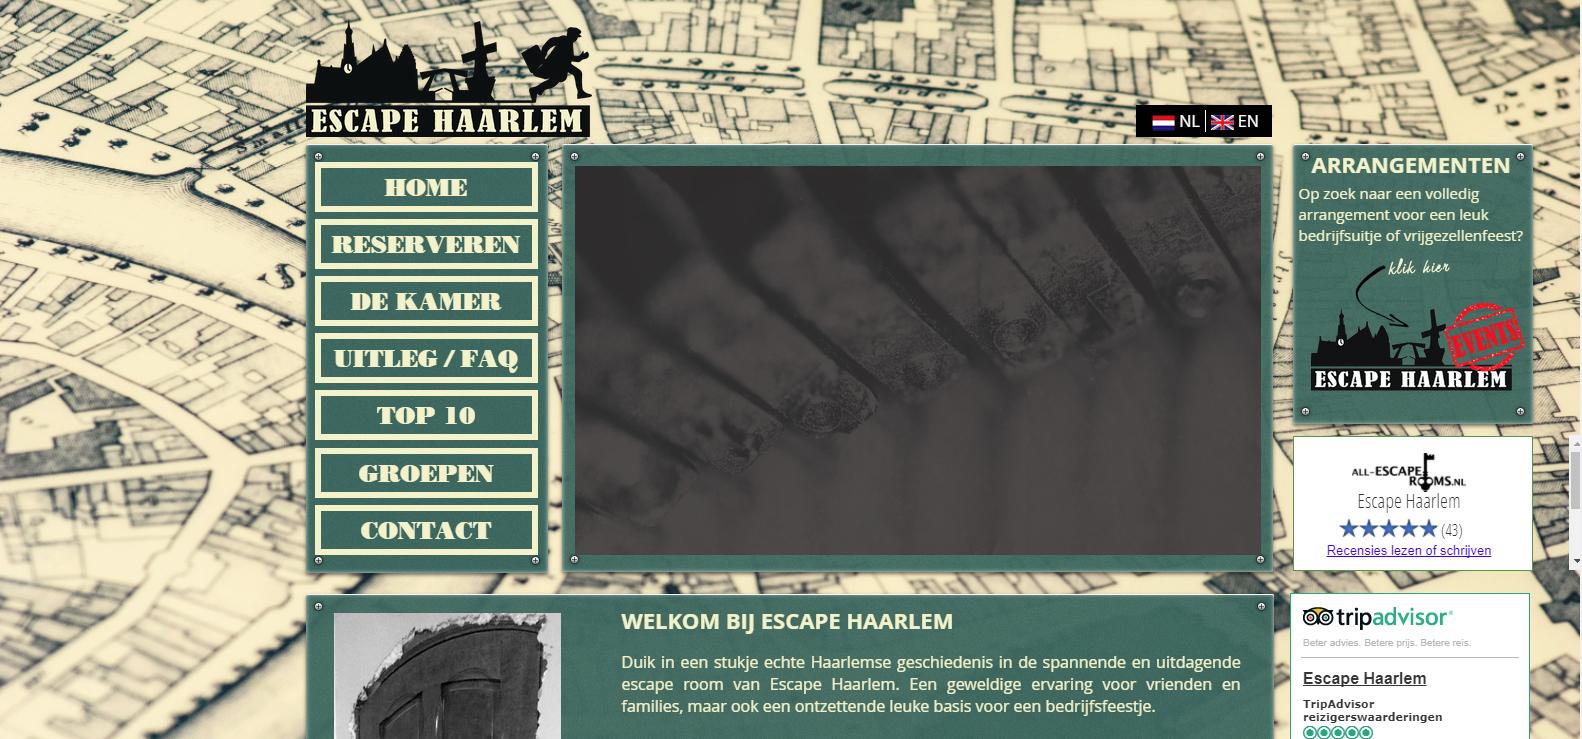 Escape Haarlem